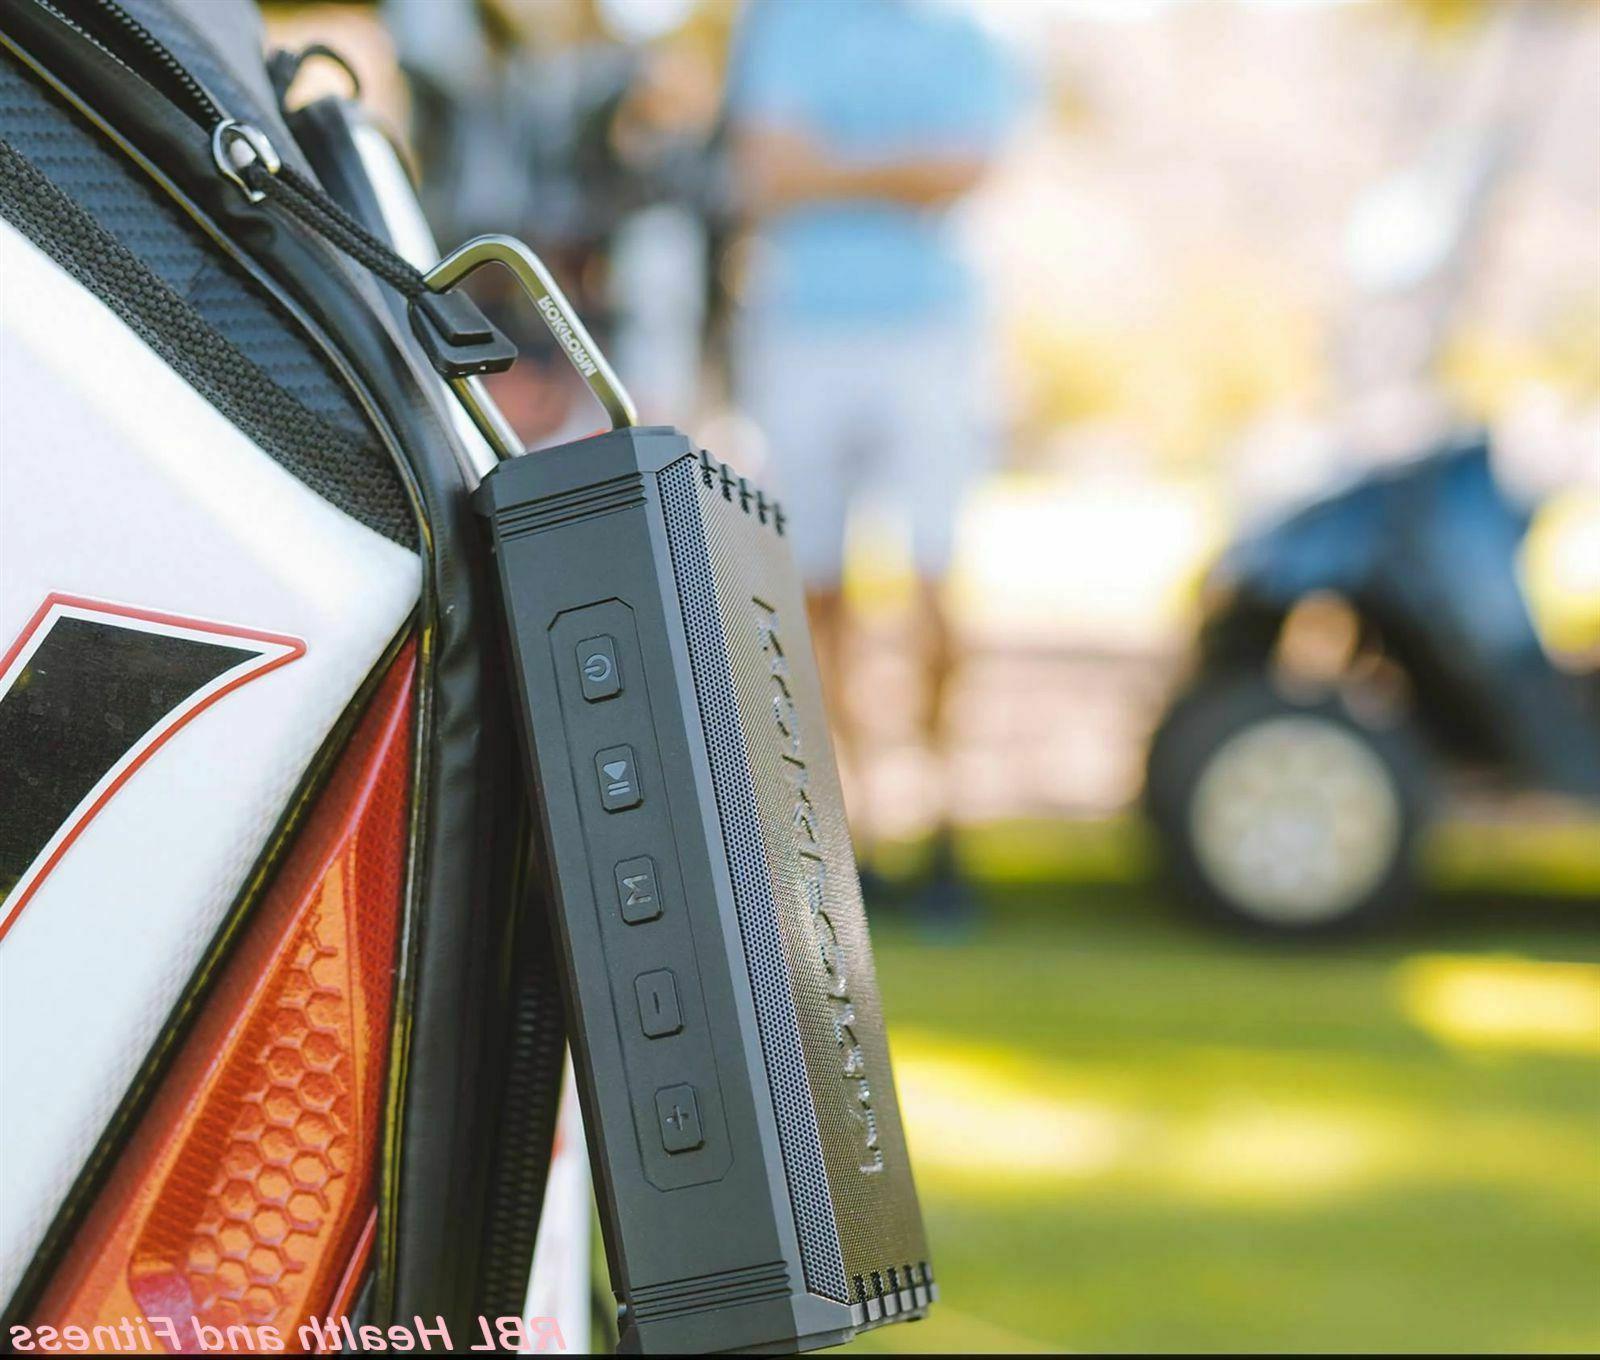 ROKFORM Portable Wireless Magnetic Golf Speaker Attach Cart or Bag